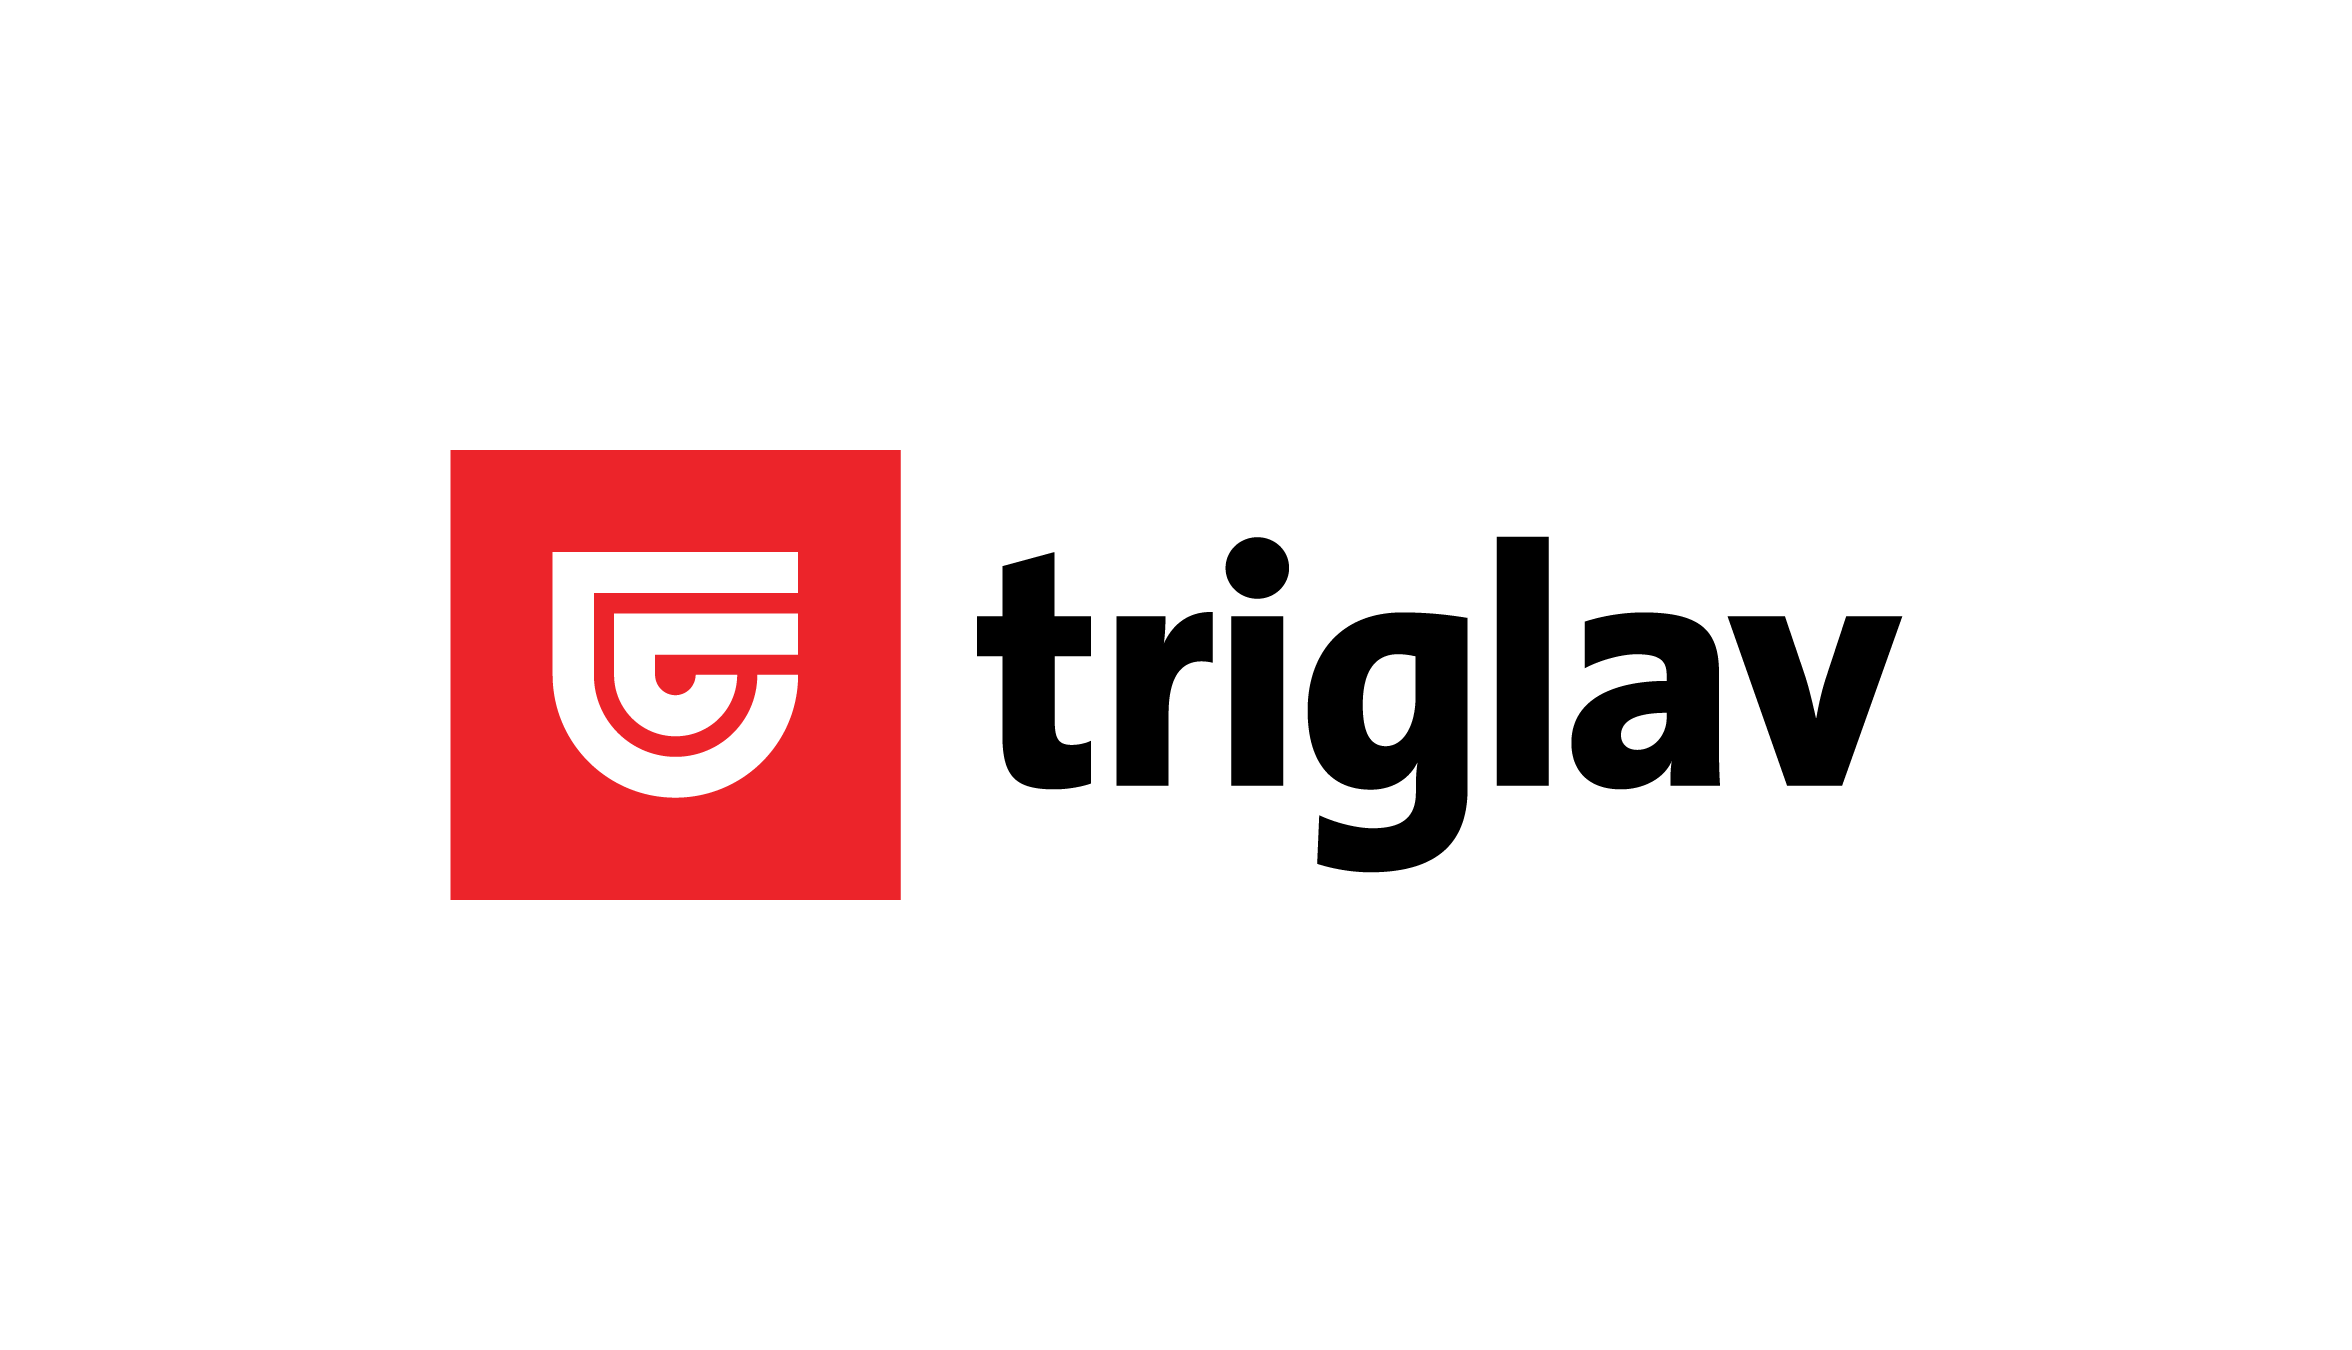 Zavarovalnica-Triglav_LOGO-Vertical_CMYK.png